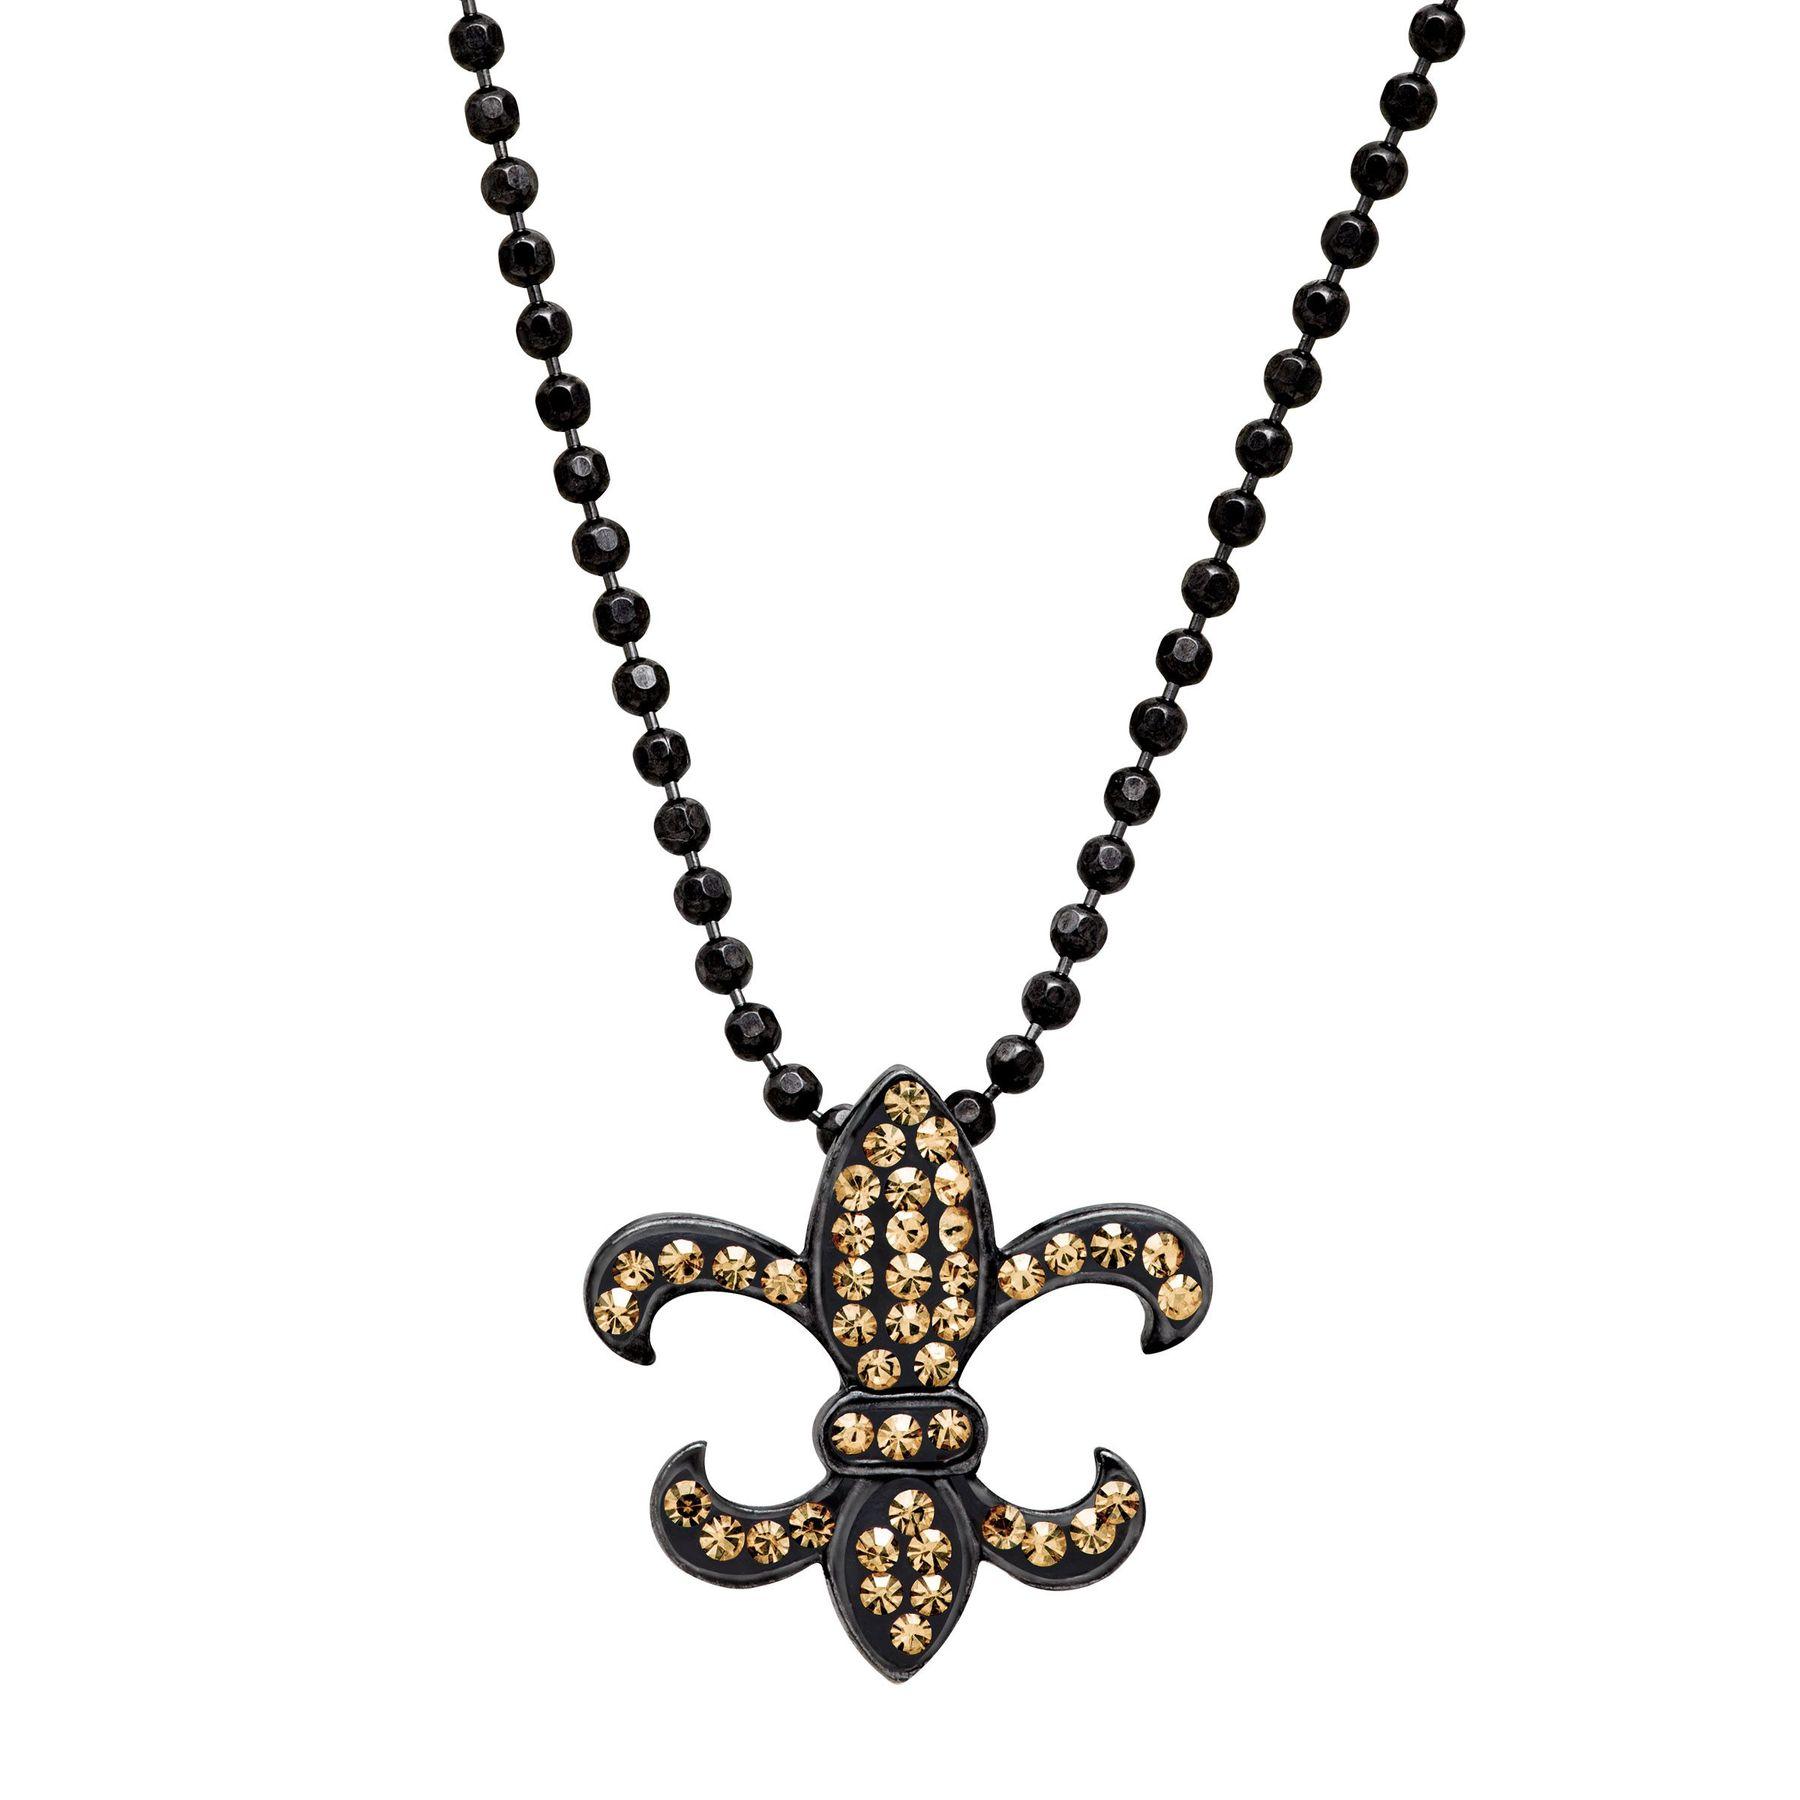 Crystaluxe fleur de lis pendant with swarovski crystals in black fleur de lis pendant with swarovski crystals aloadofball Choice Image